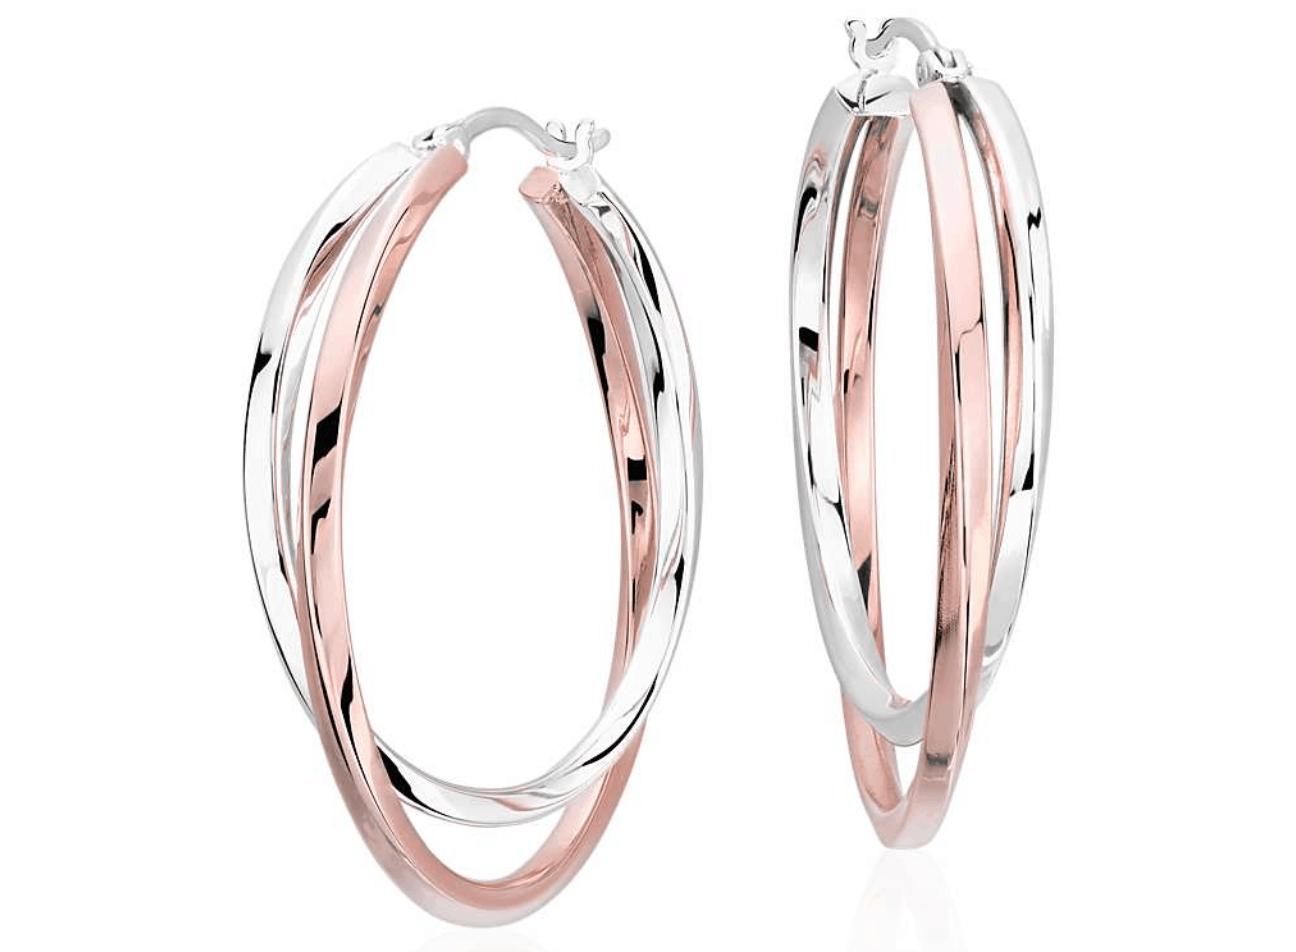 Intertwining Hoop Earrings